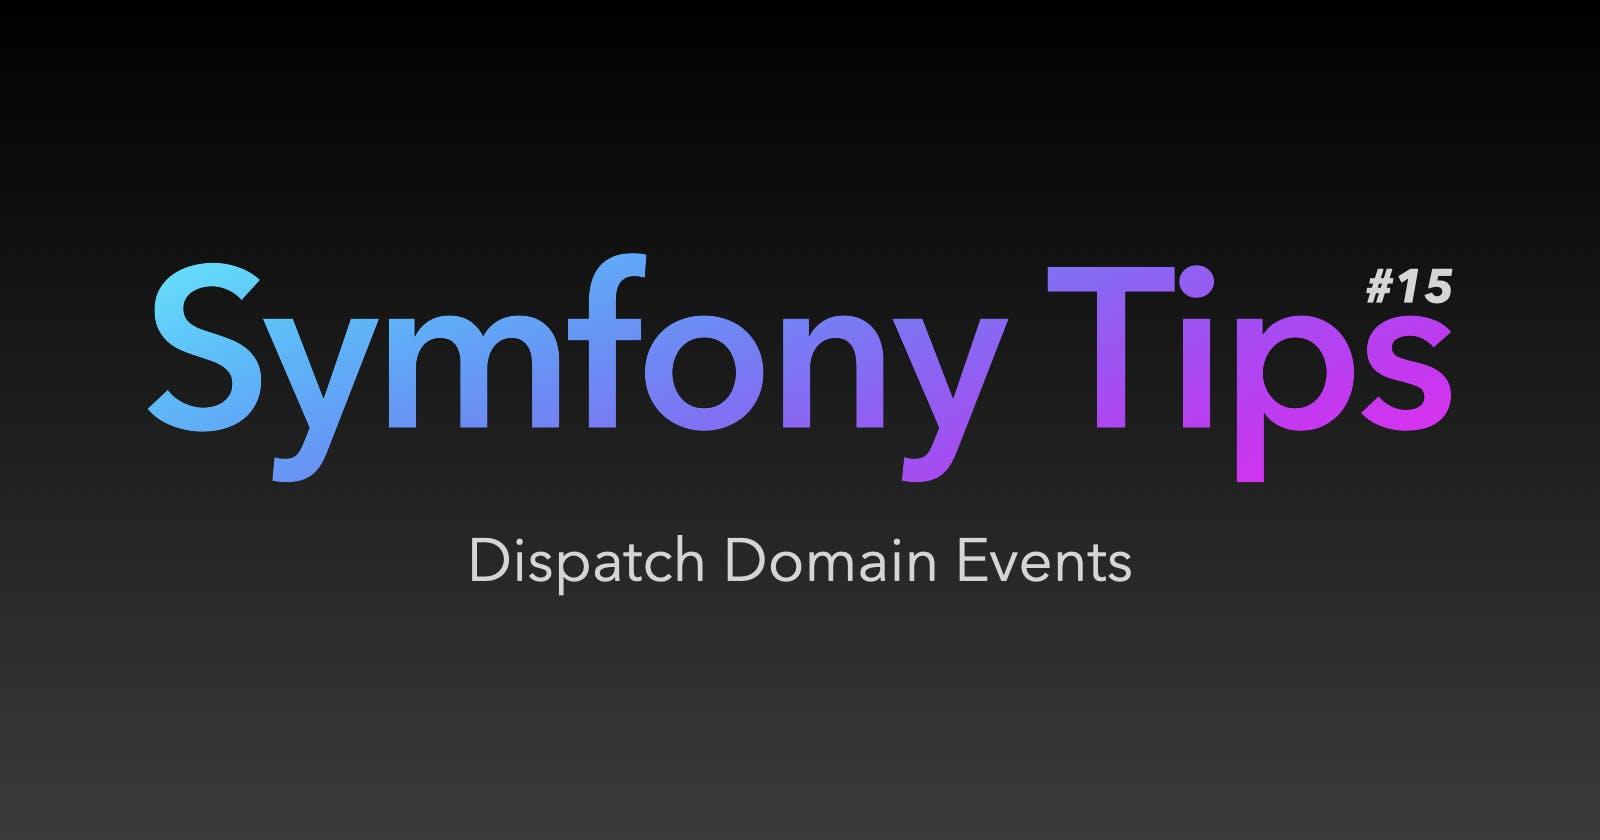 Symfony Tips #15 - Dispatch Domain Events